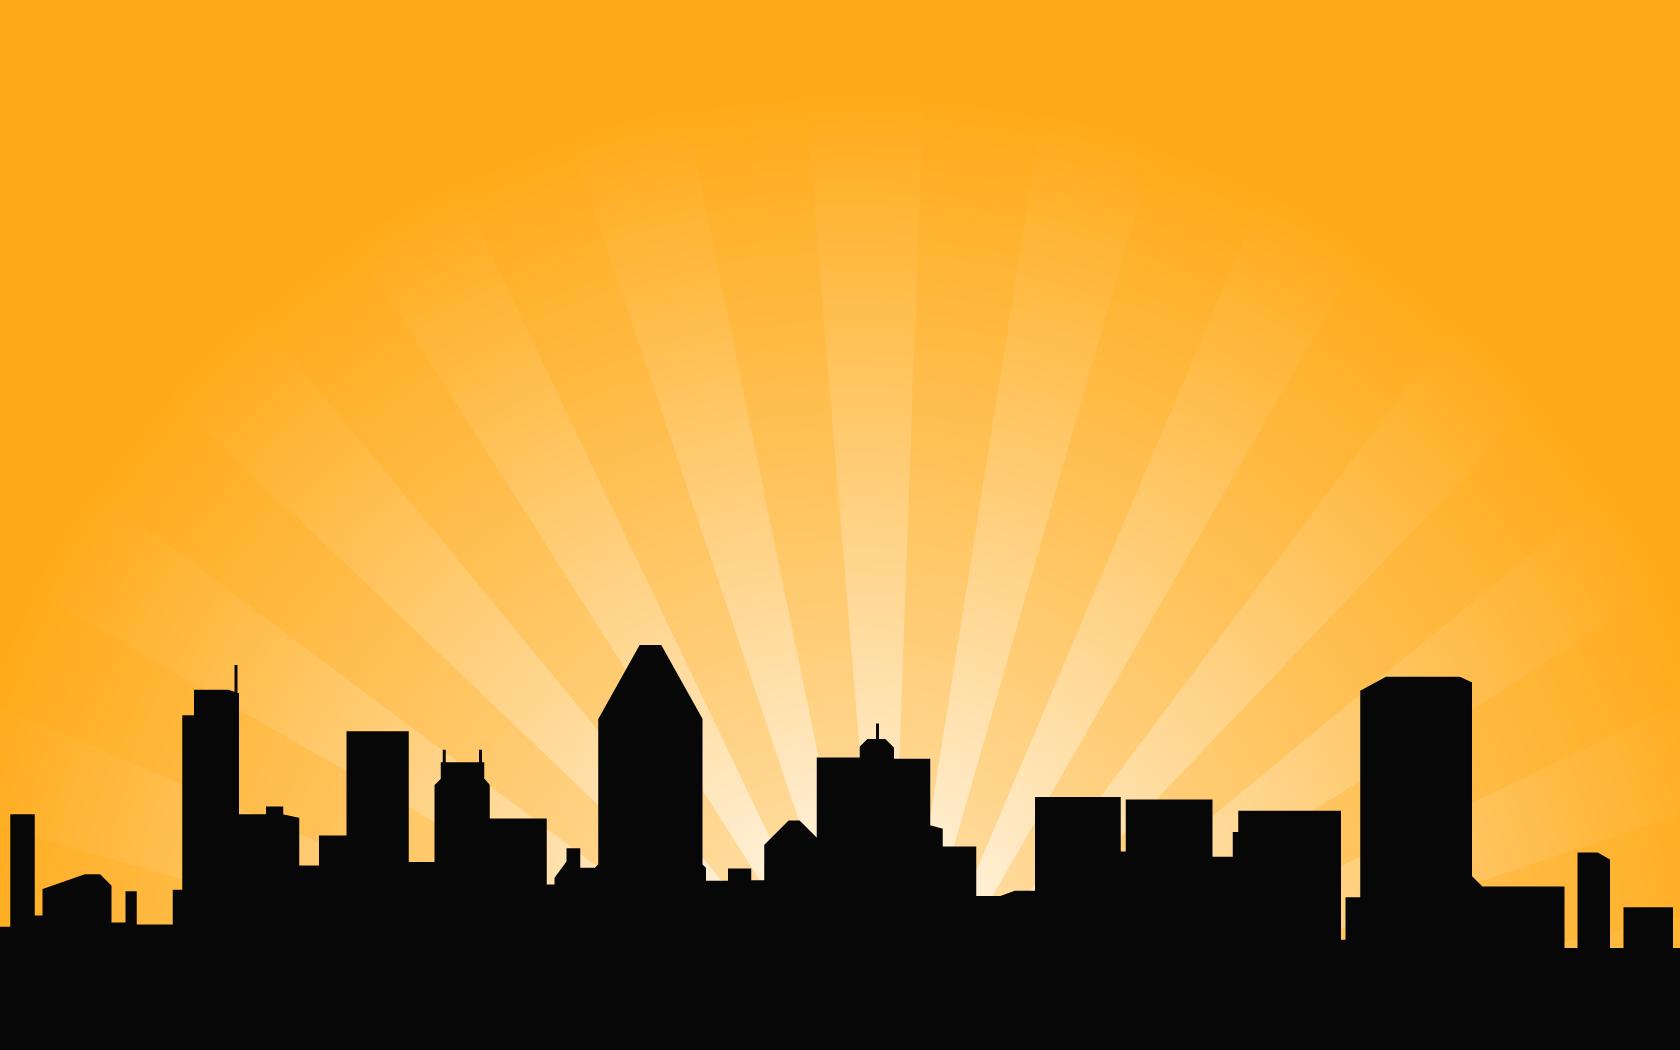 1680x1050 City Skyline Vector Background